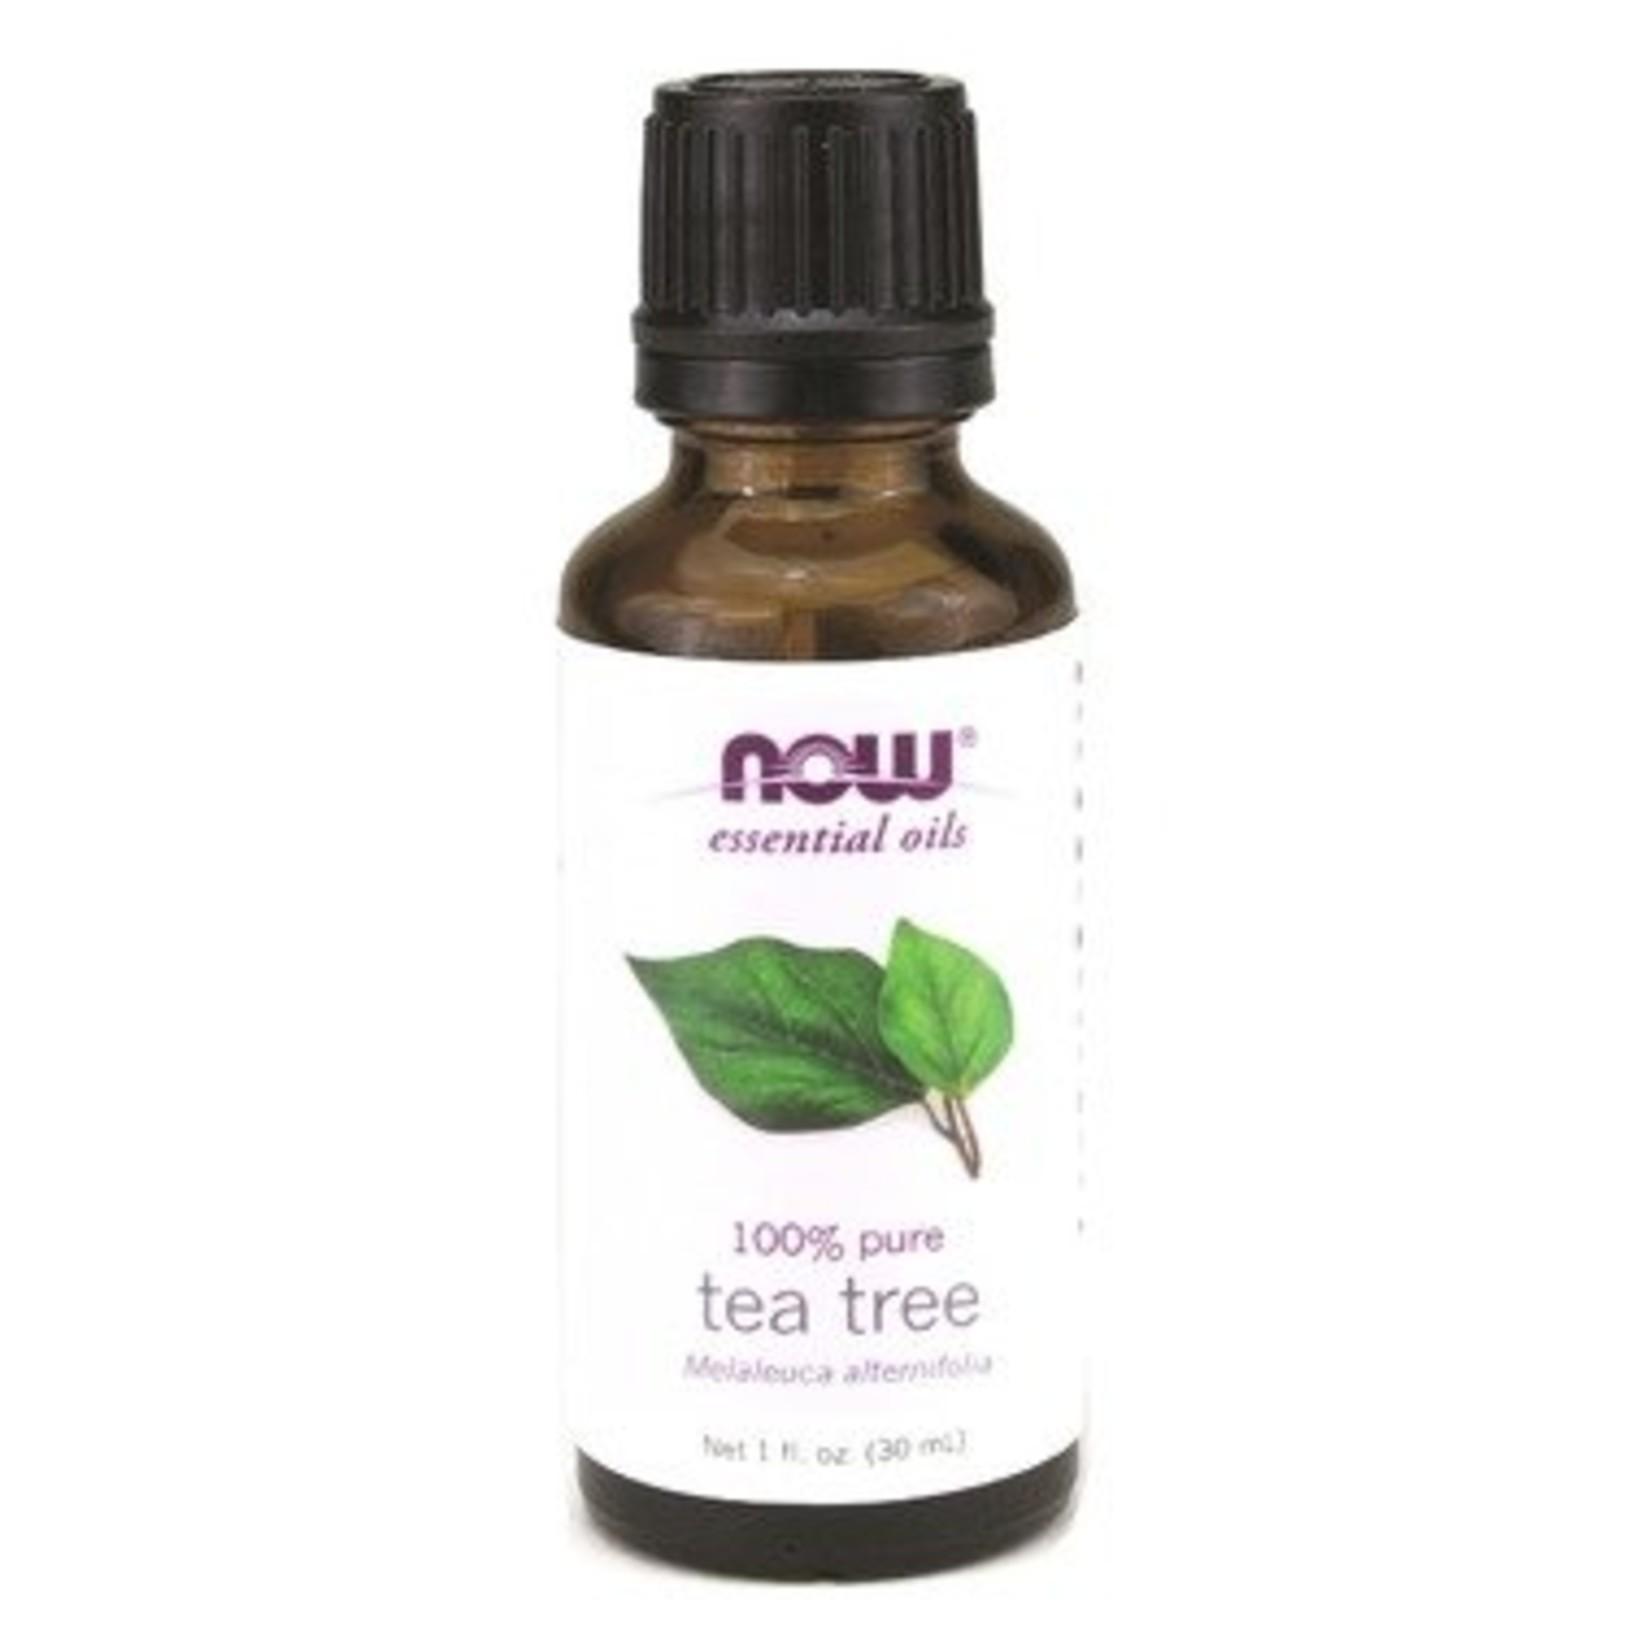 NOW NOW Tea Tree Oil 30mL